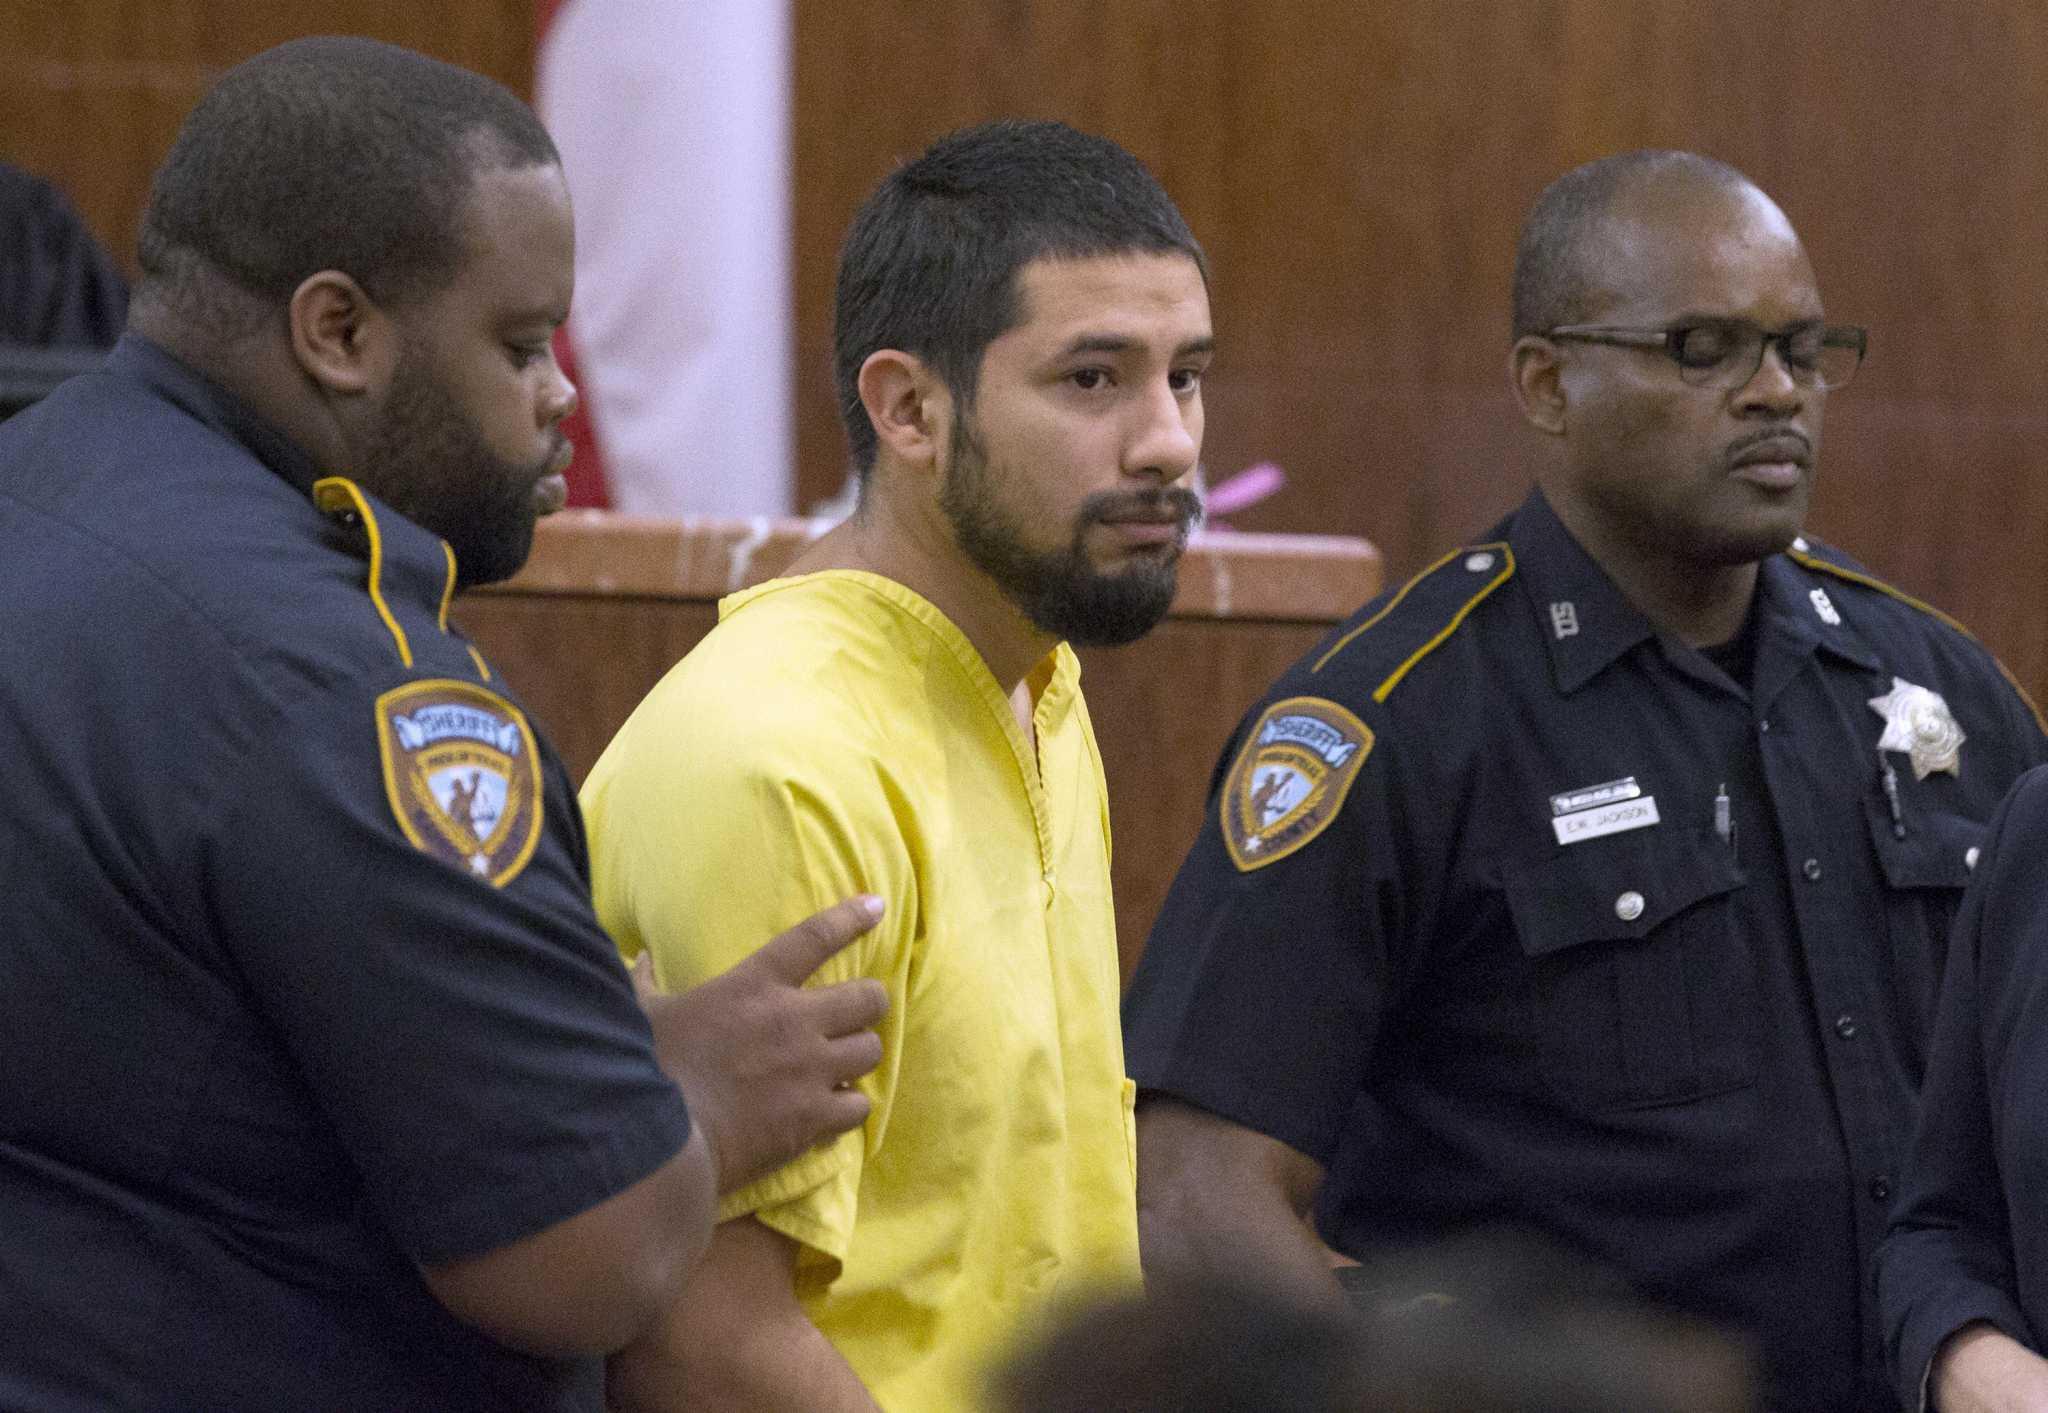 HPD officers, Texas senators condemn Acevedo's gun control remarks after sergeant's death